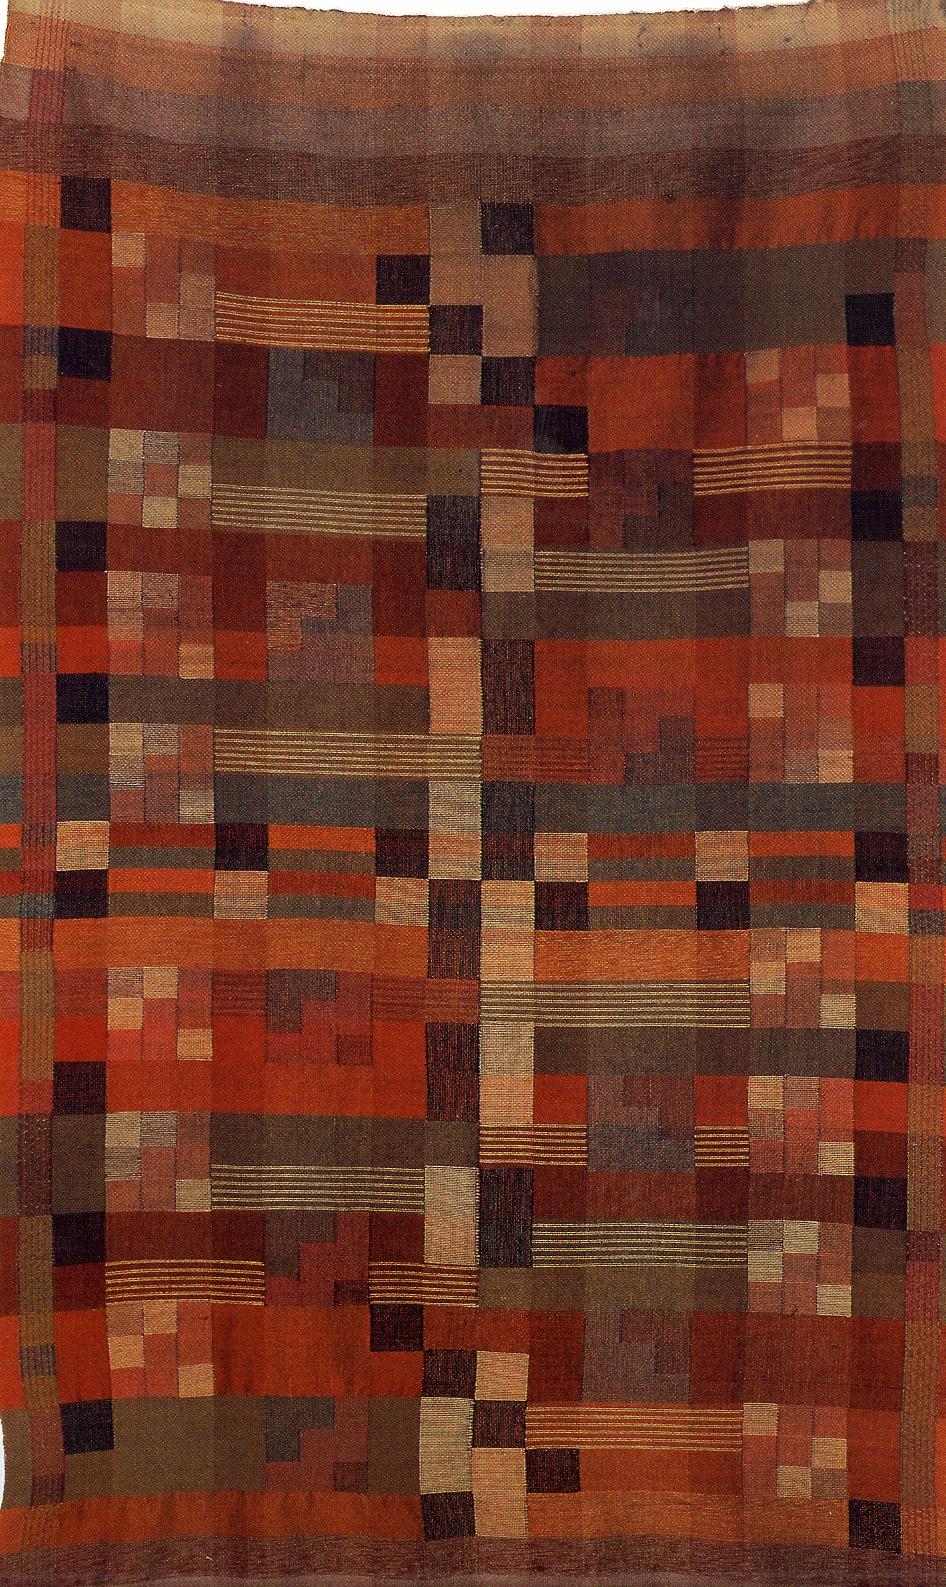 Gunta Stolzl Bauhaus Weaver and Textile Designer I had